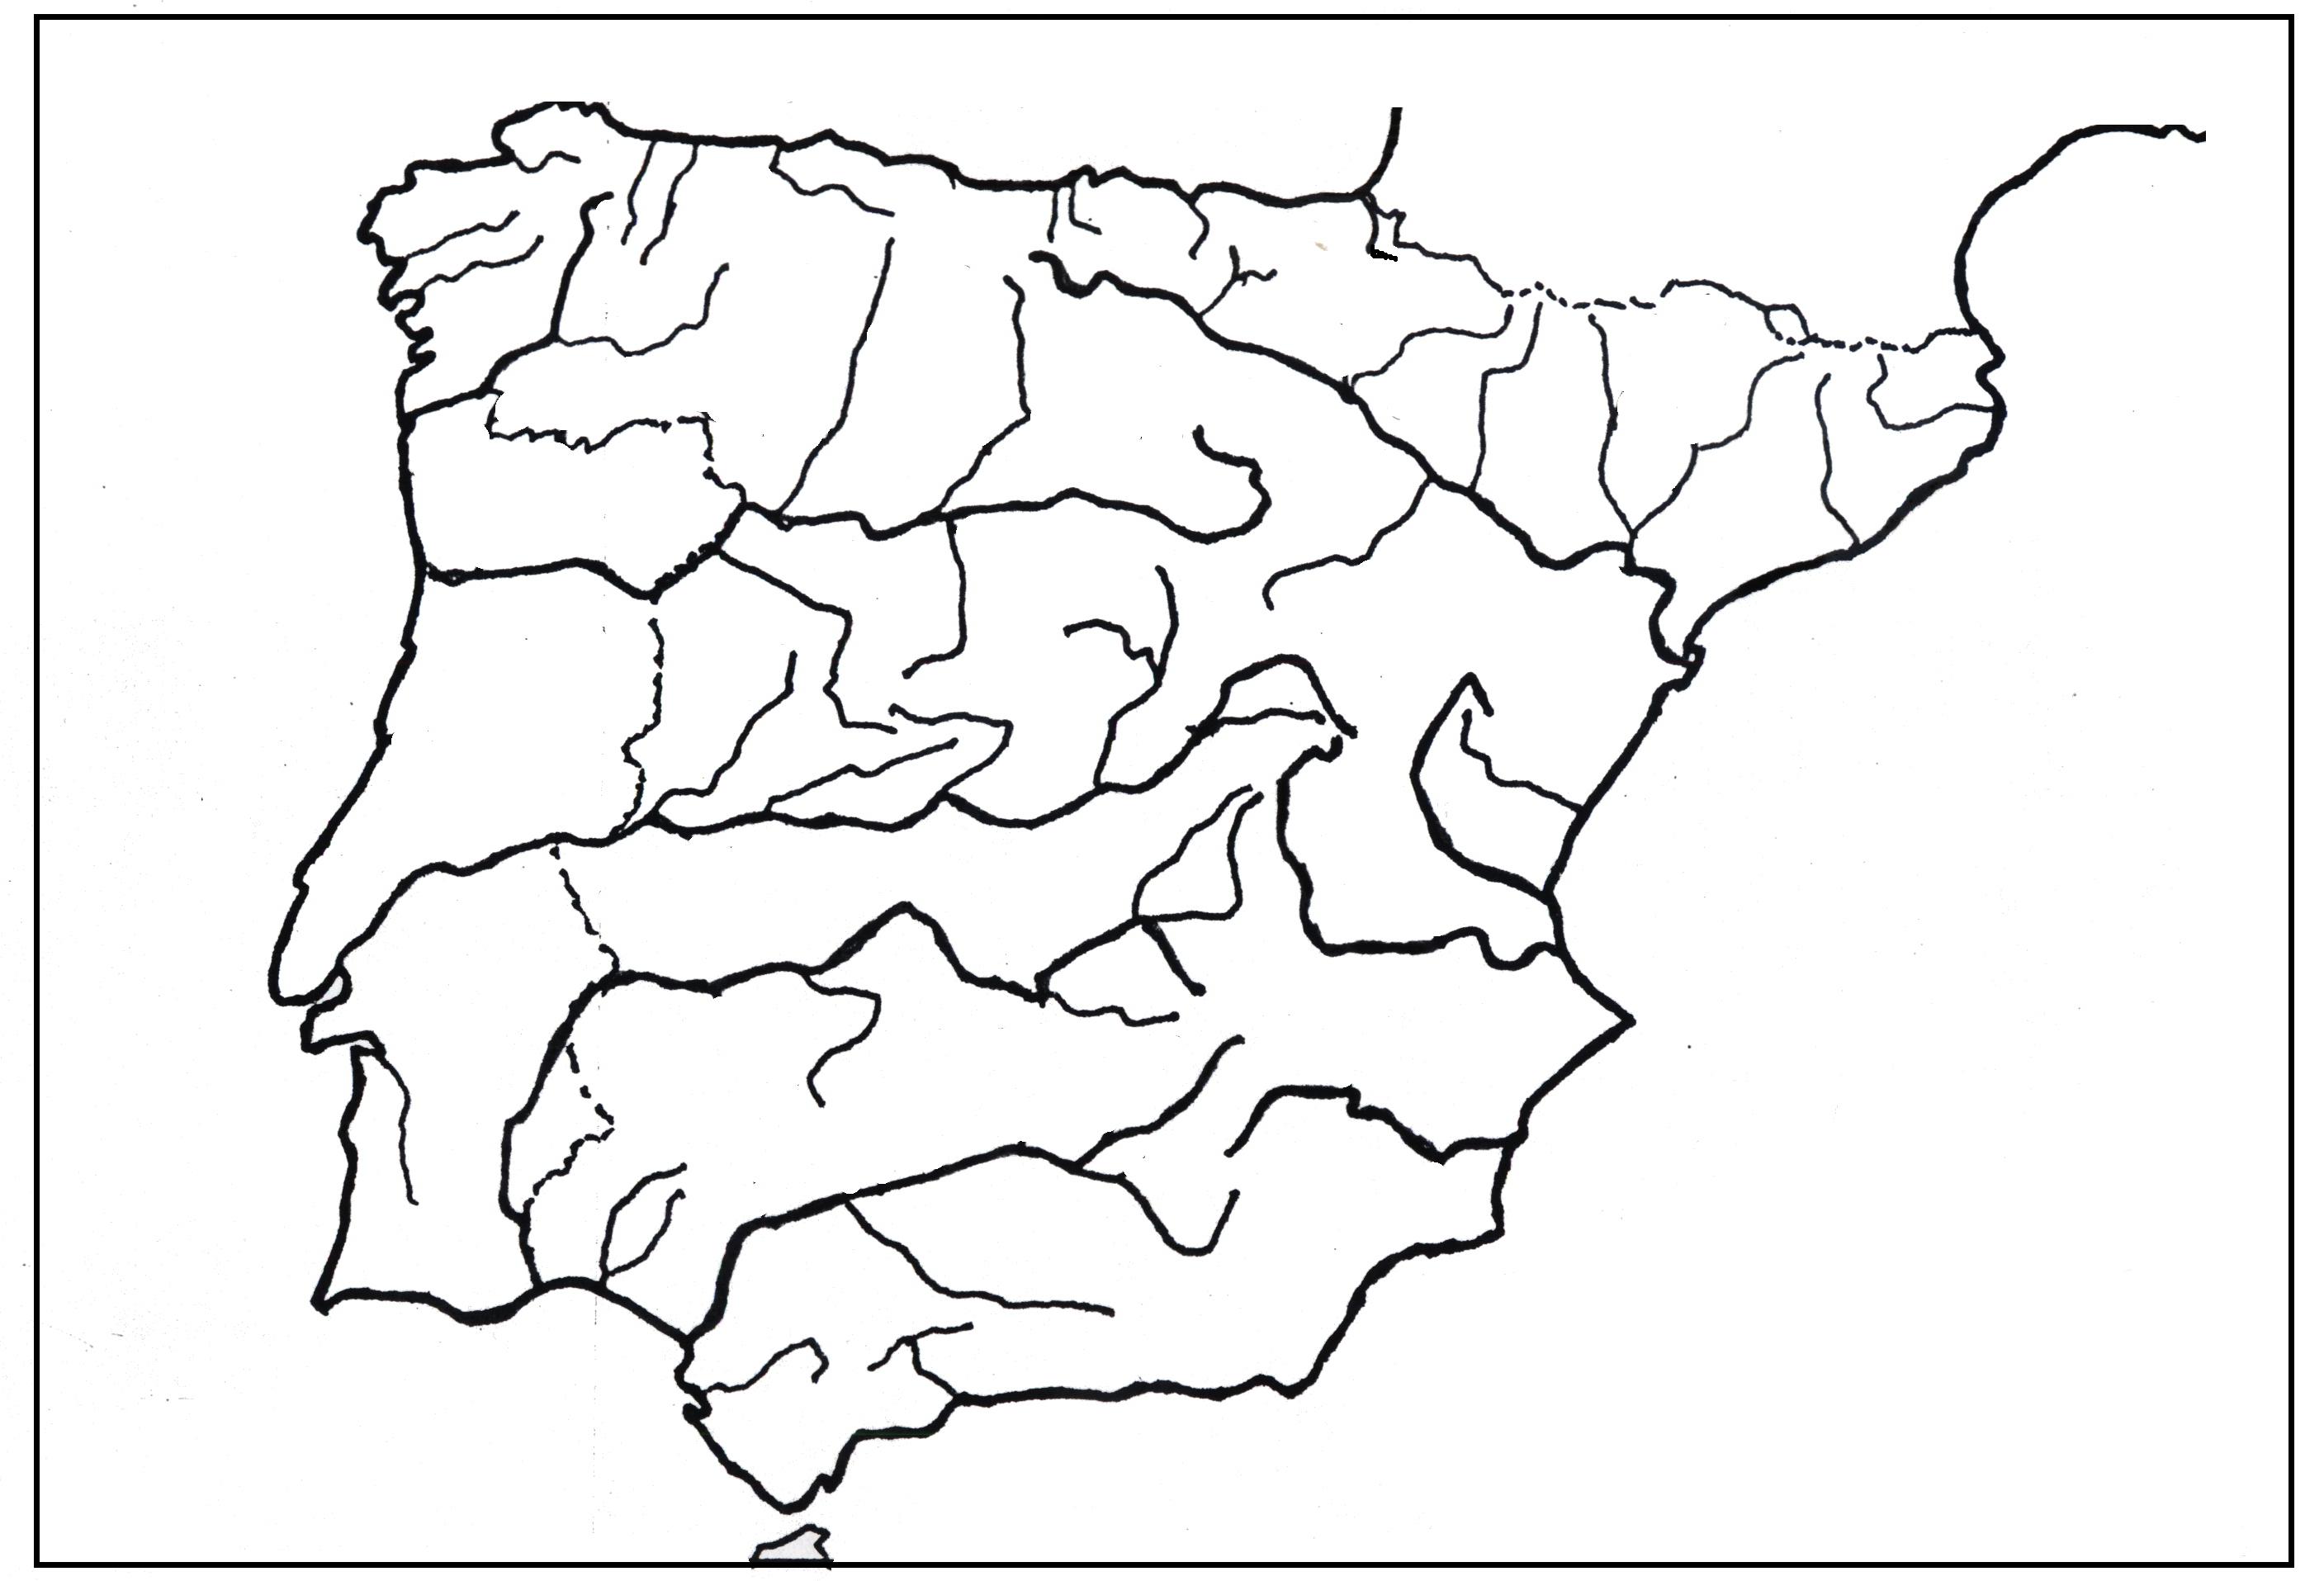 Mapa De España Mudo Rios Para Imprimir.Mapa Mudo De Rios De Espana Para Hacer